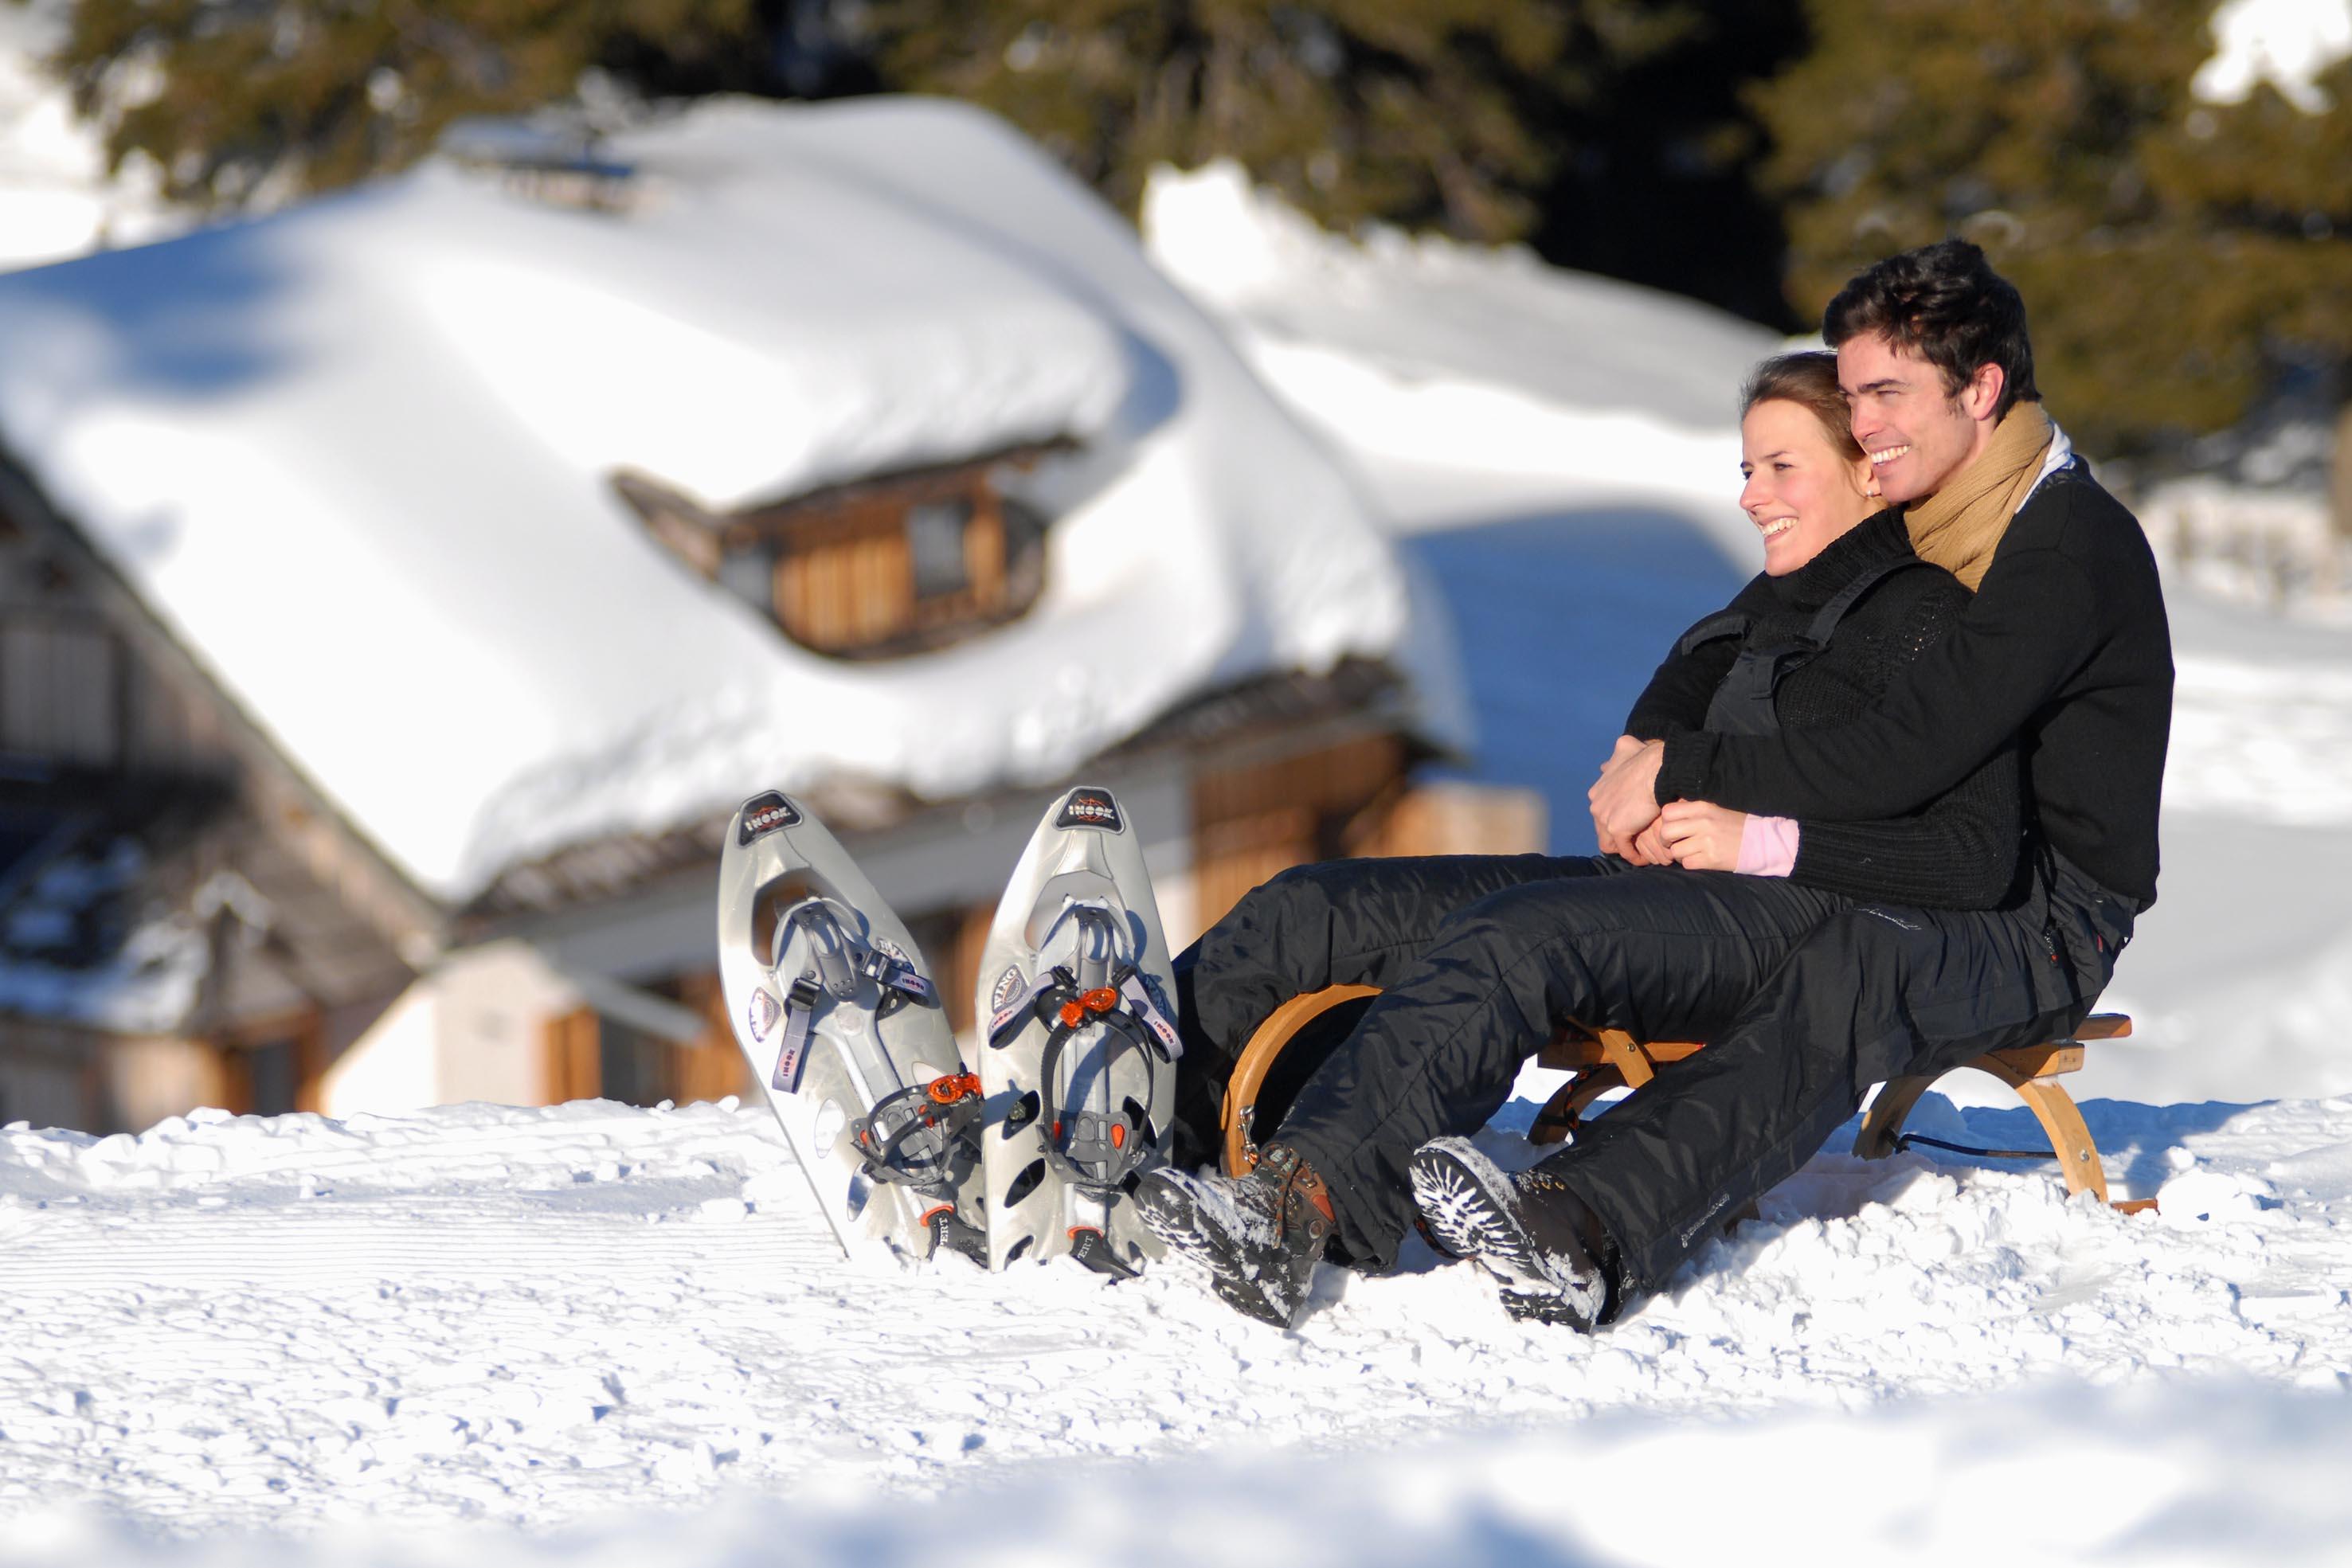 San Valentino in montagna a Villach